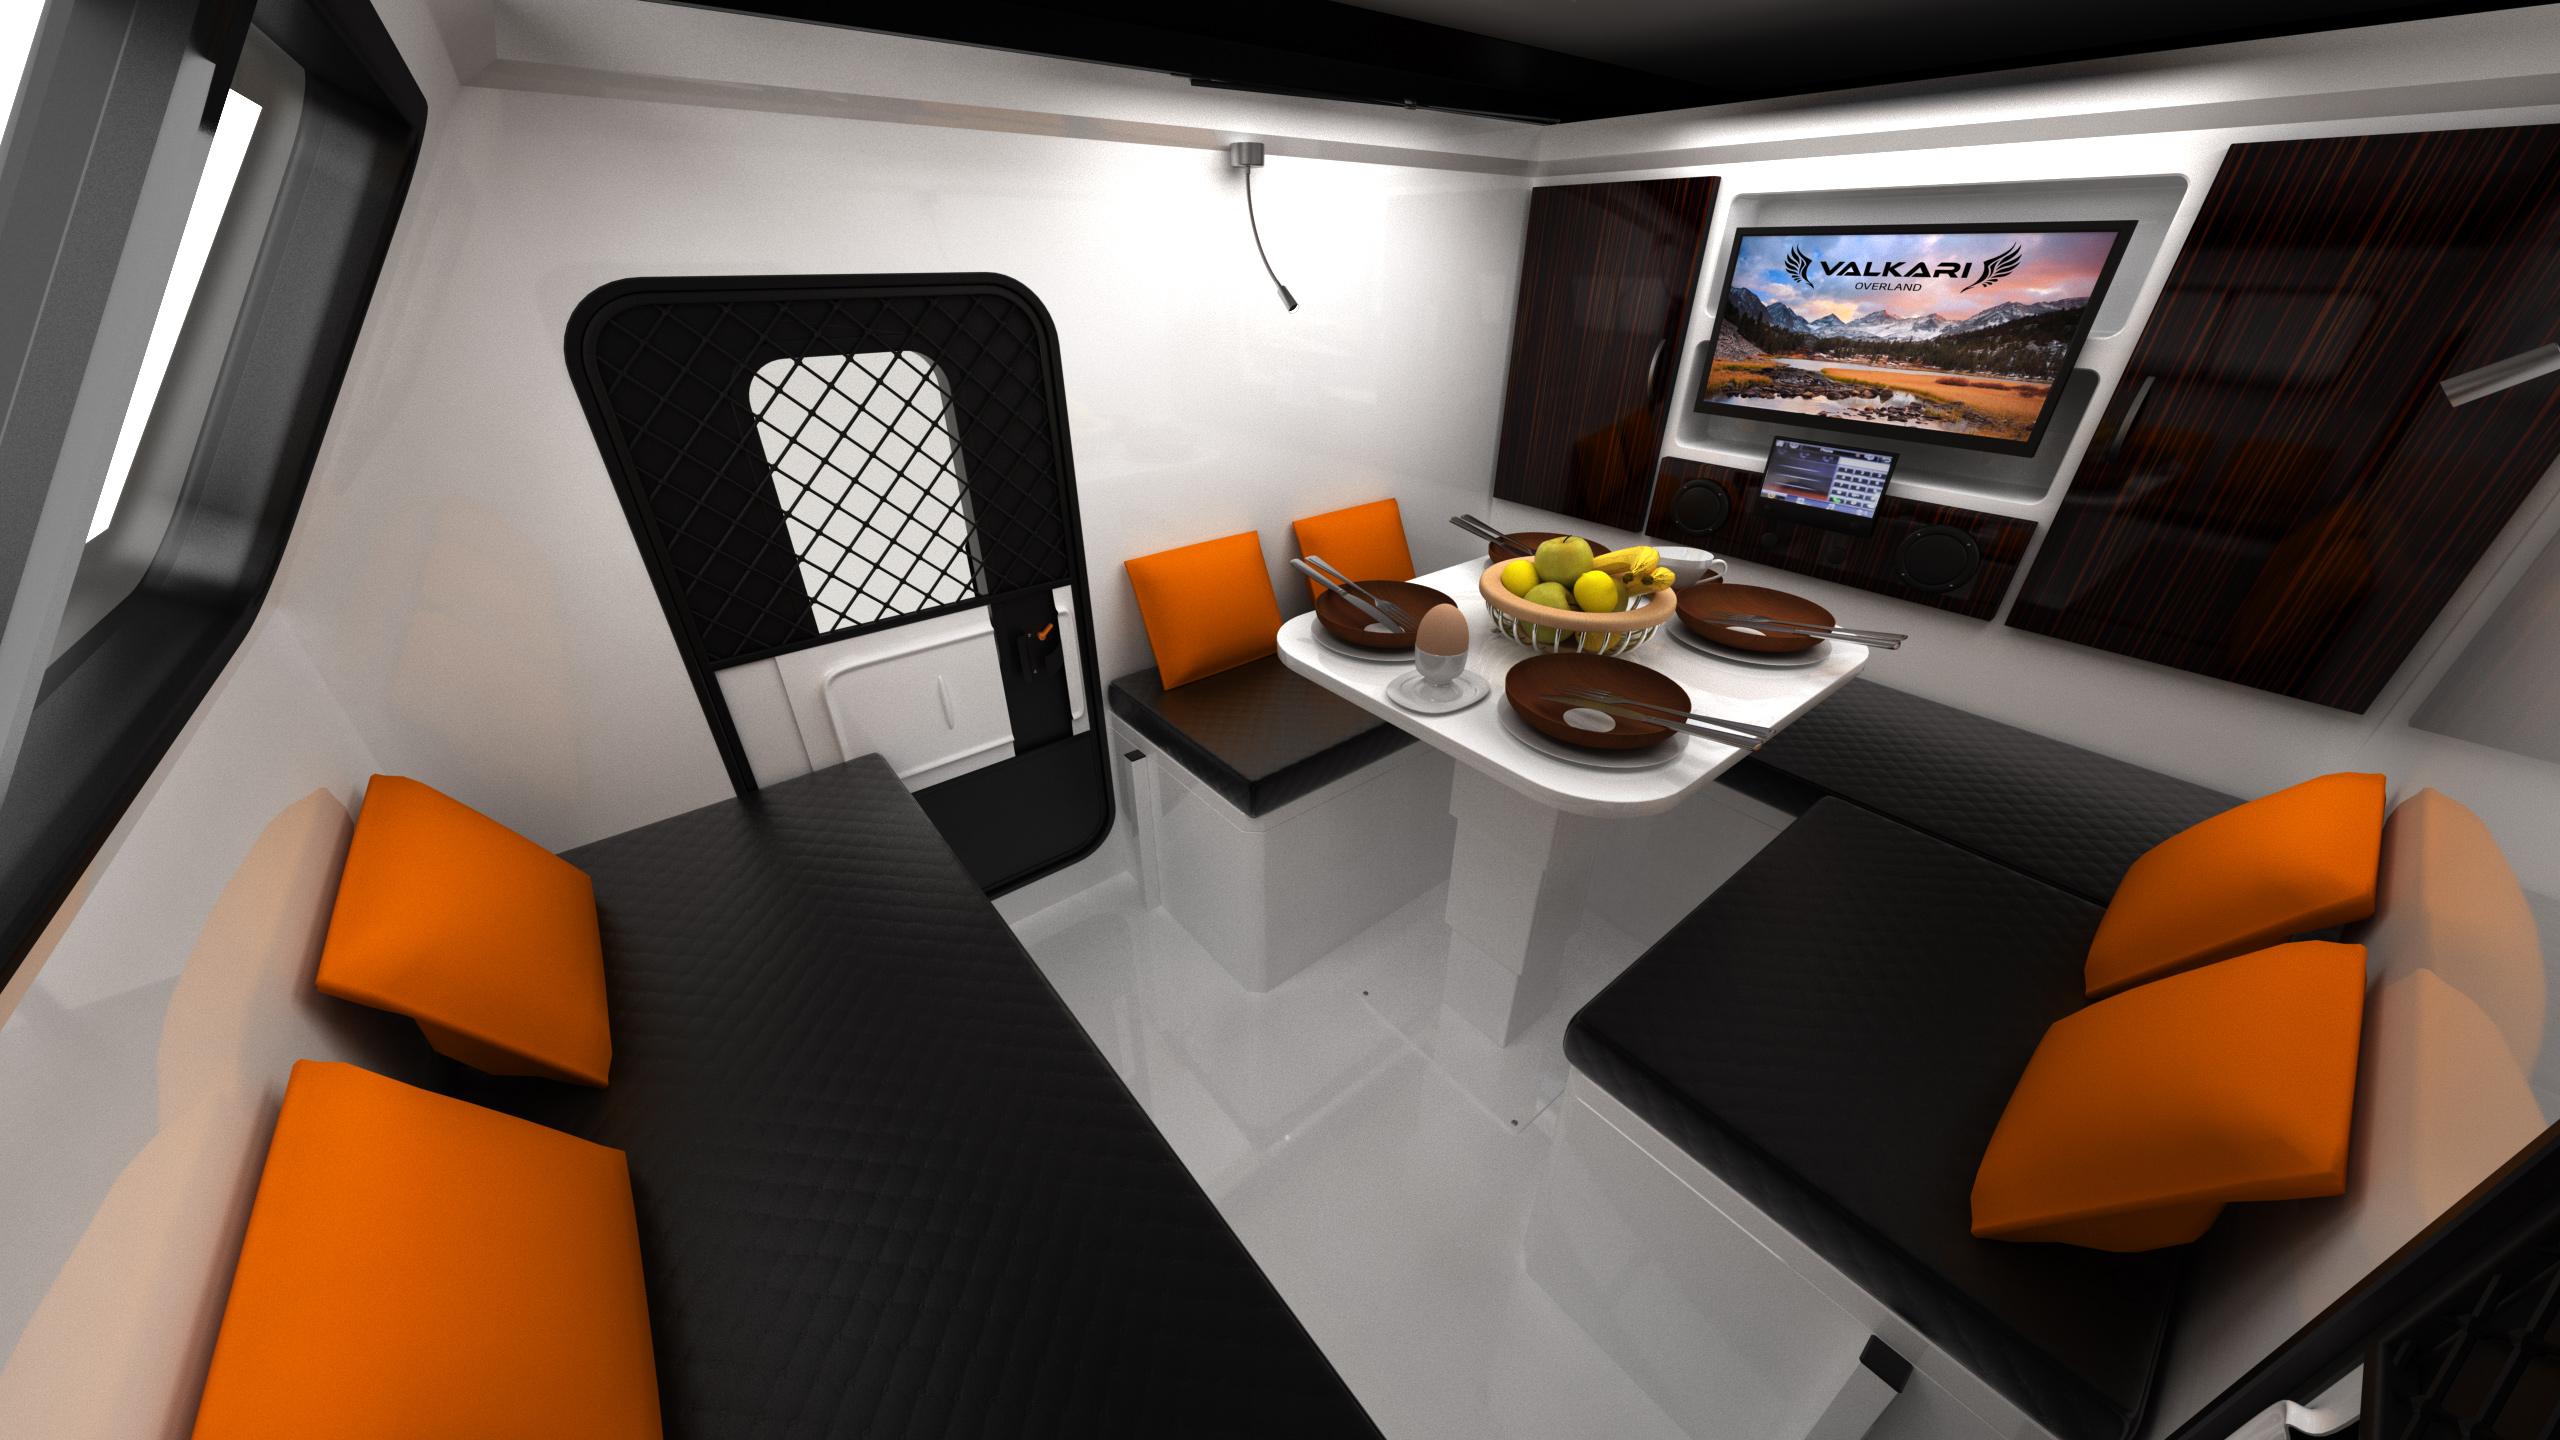 Interior-Wide-Angle